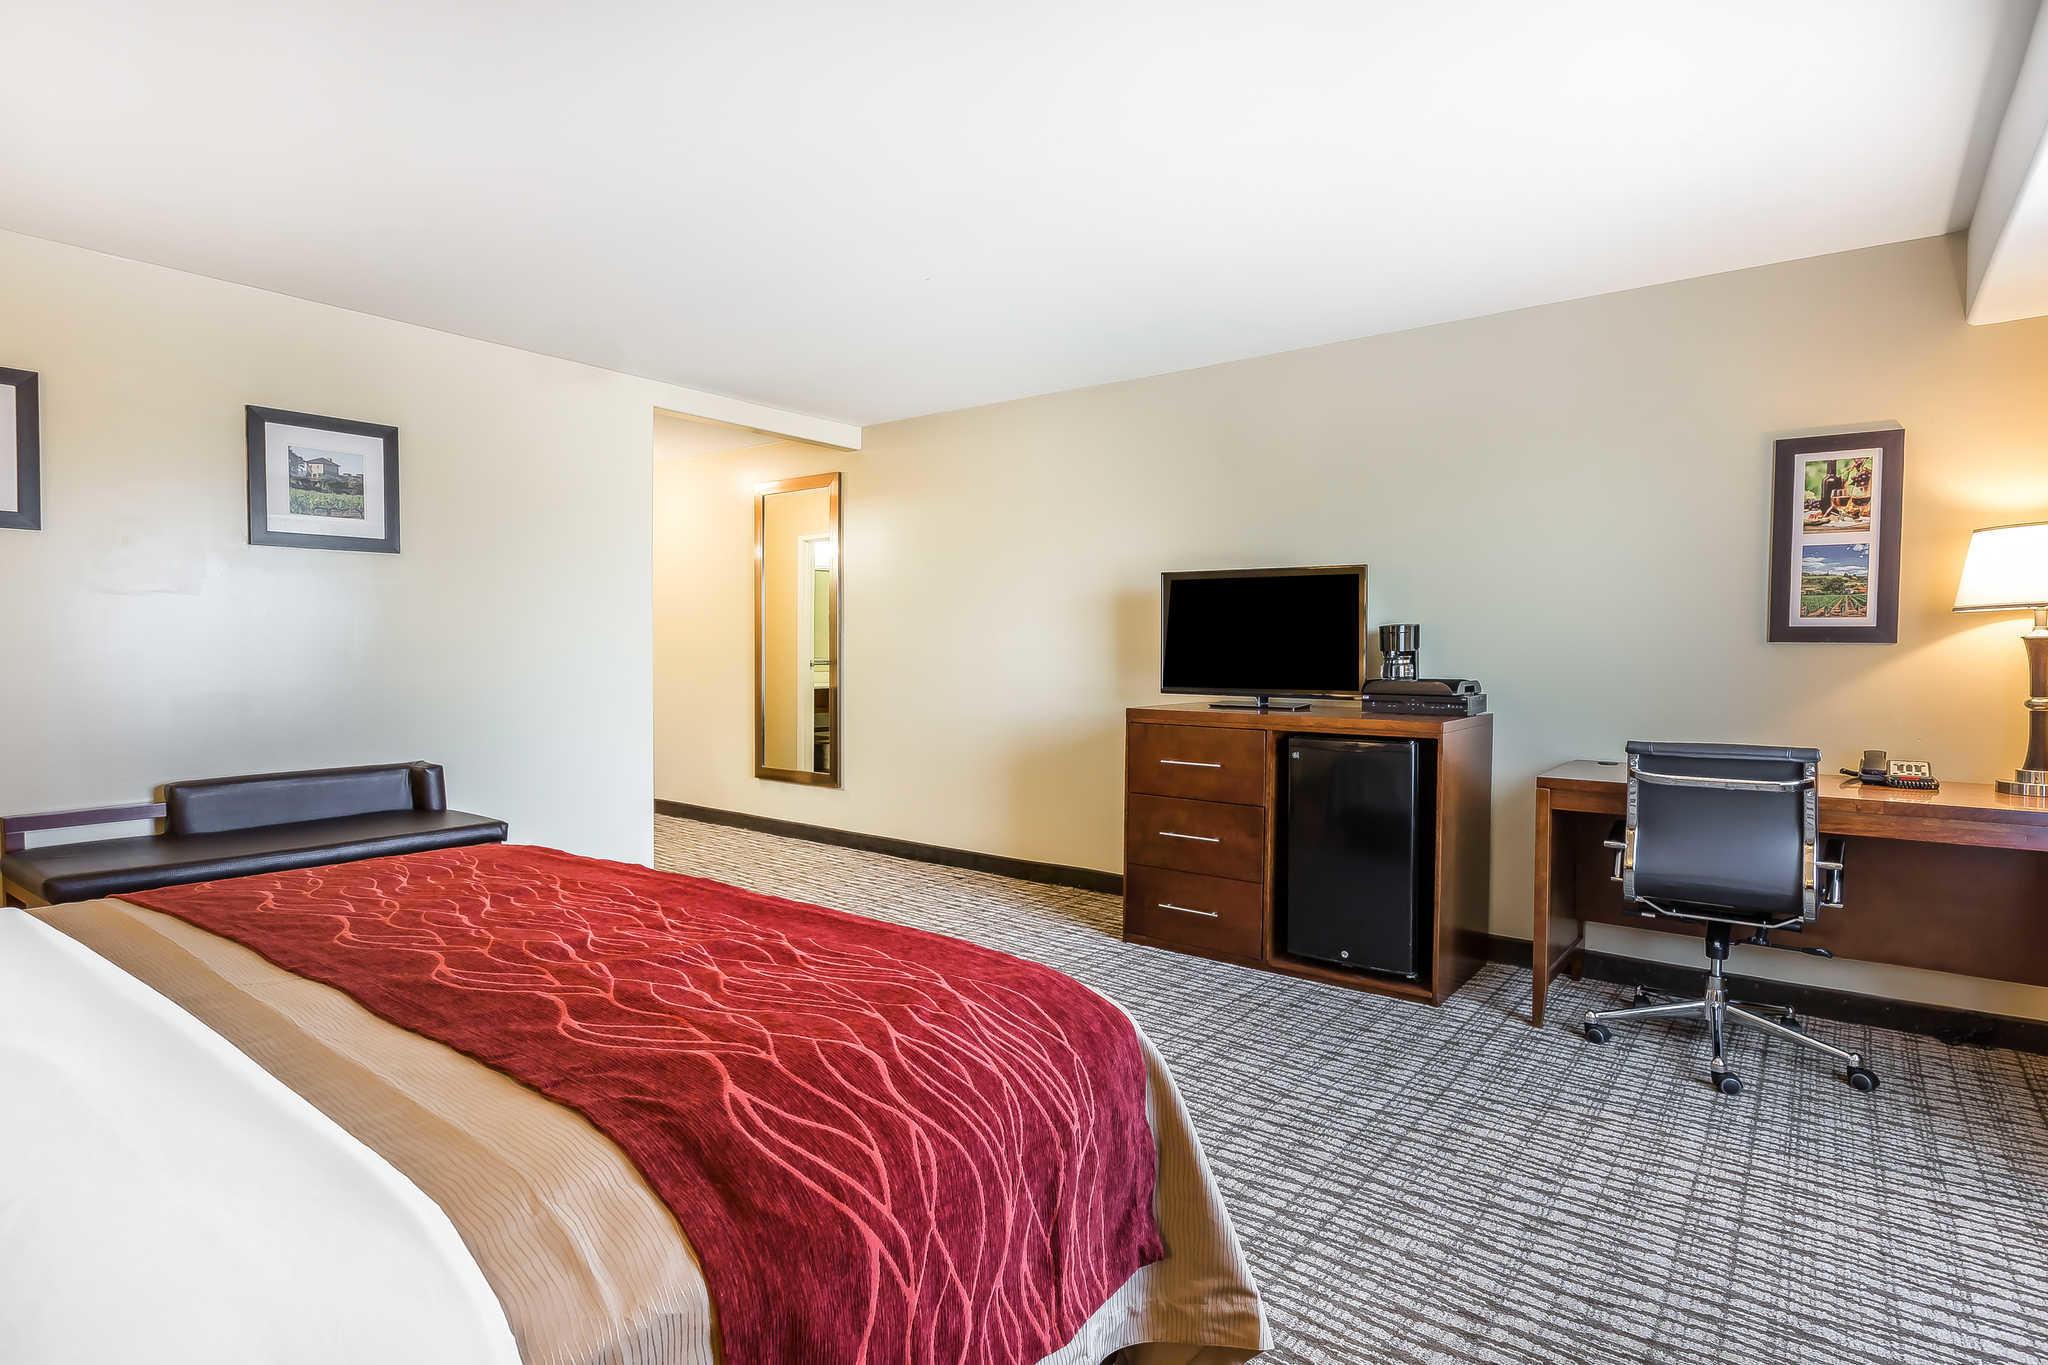 Comfort Inn Near Fairplex Coupons Pomona Ca Near Me 8coupons